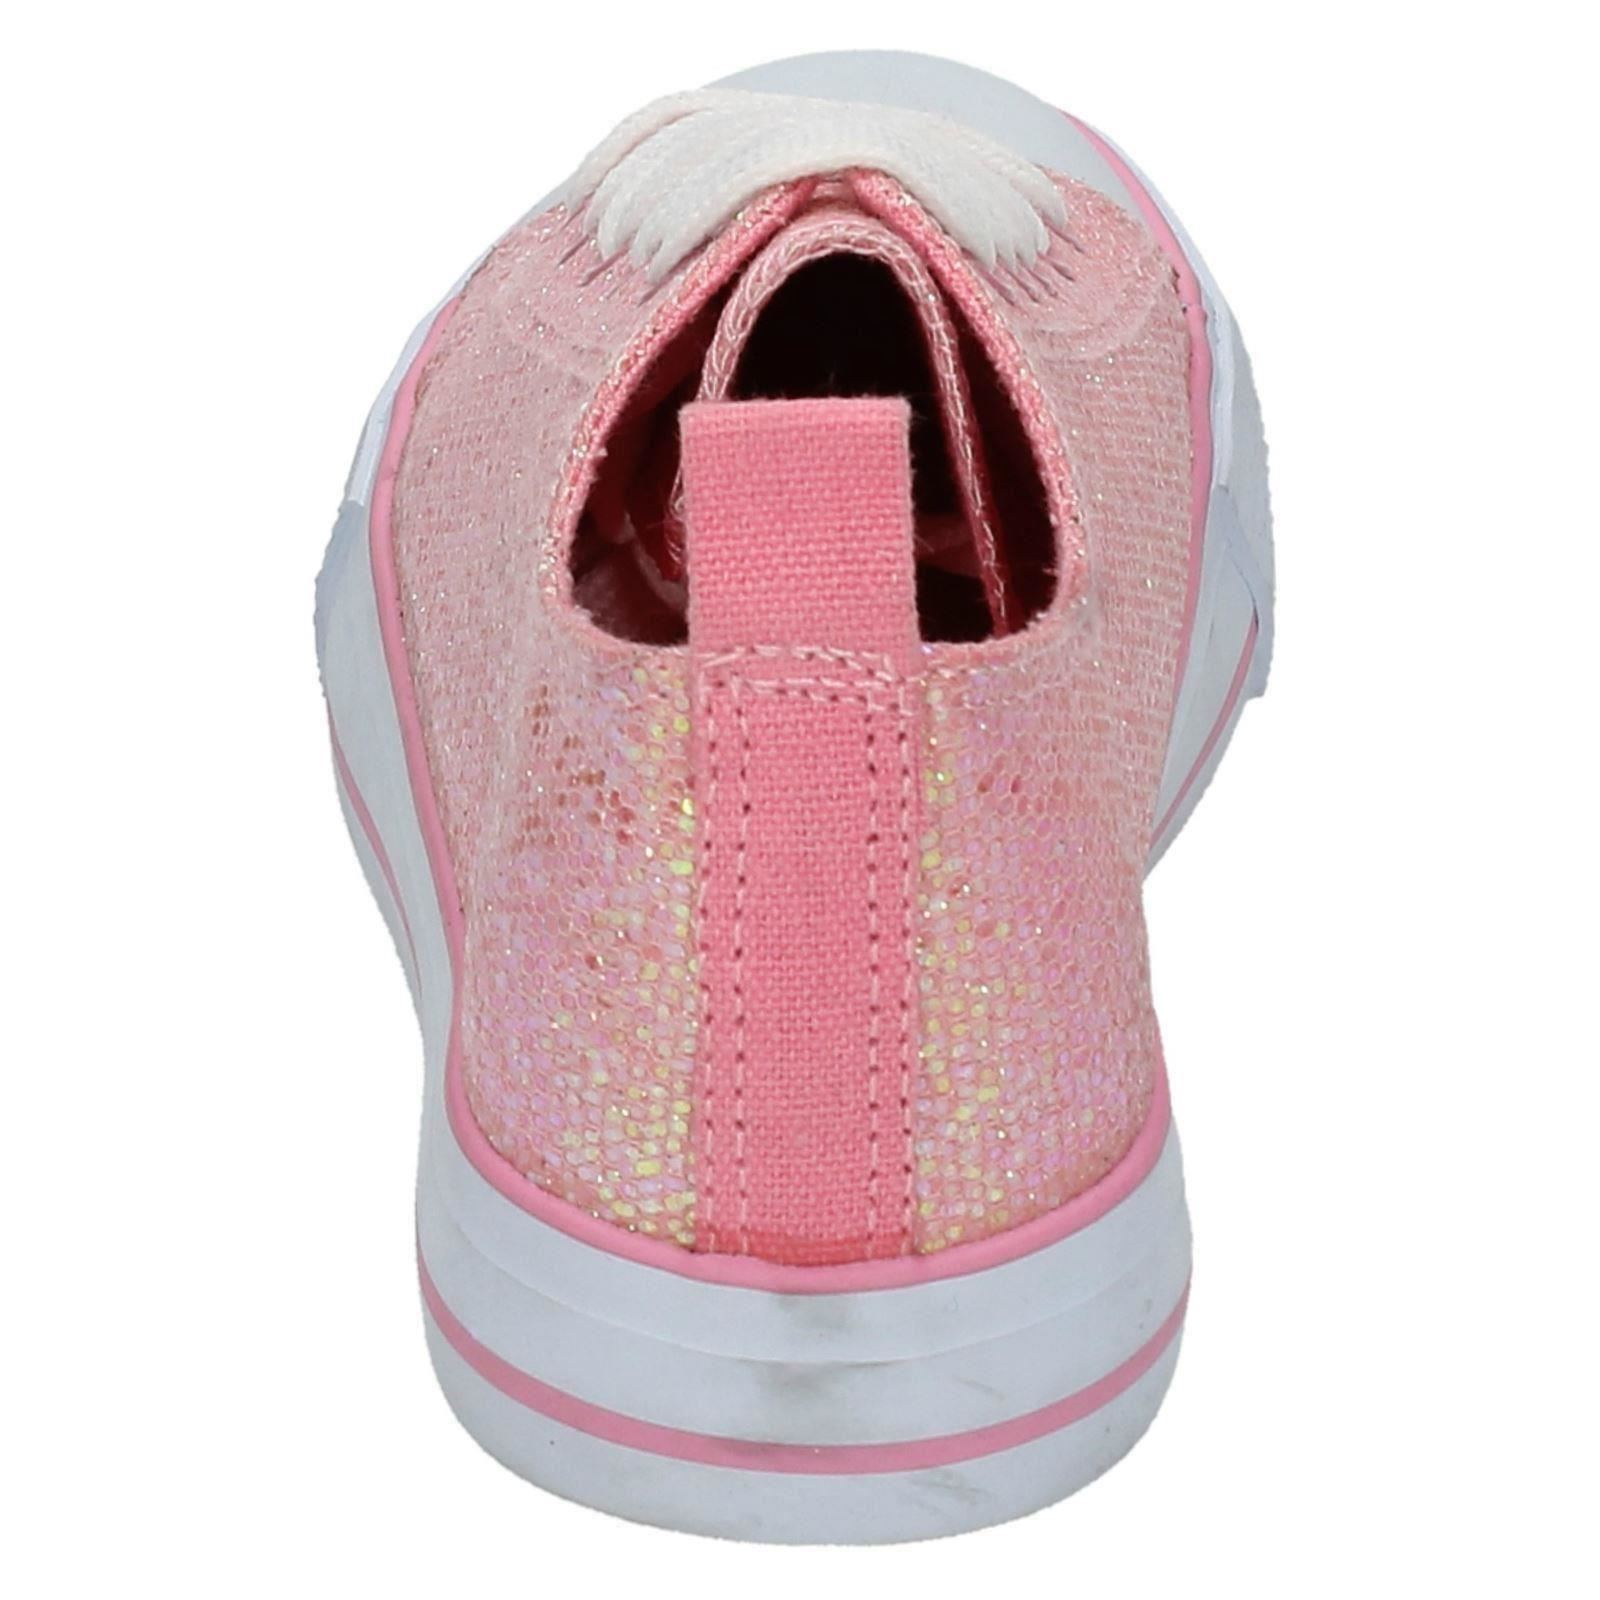 Ragazze Spot on glitterate Pompe